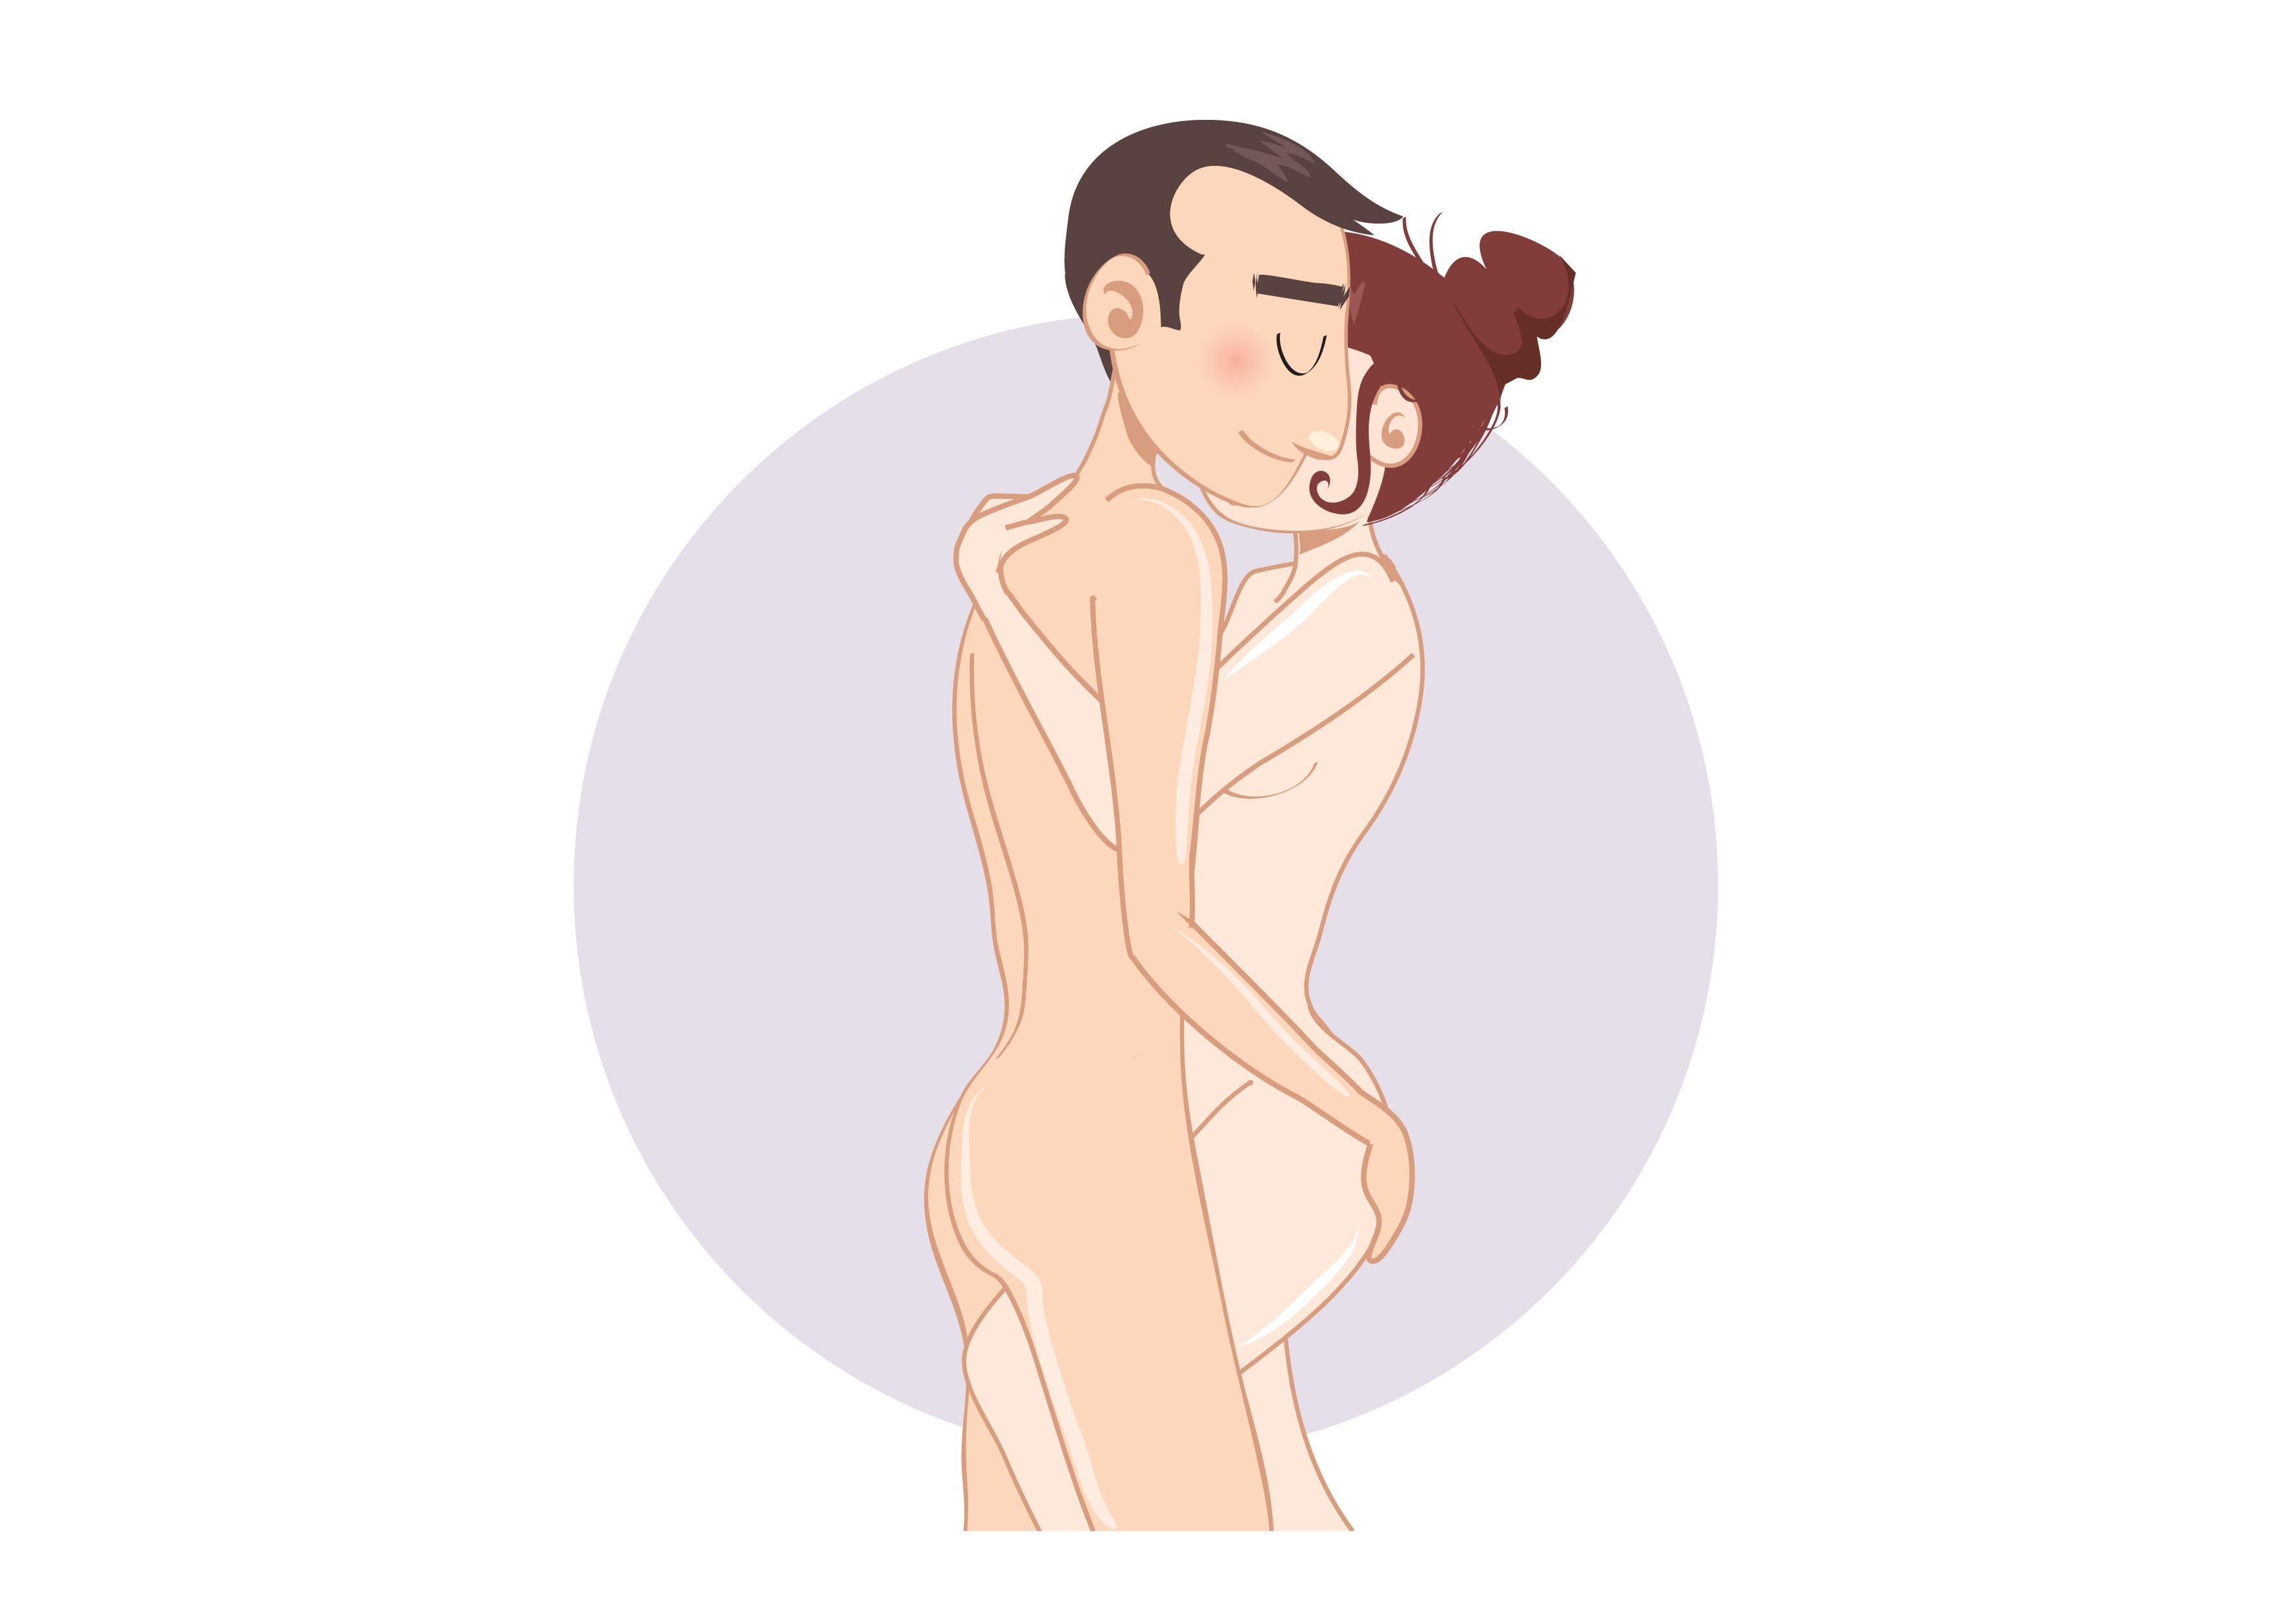 Kuscheln sex Erotik Sex